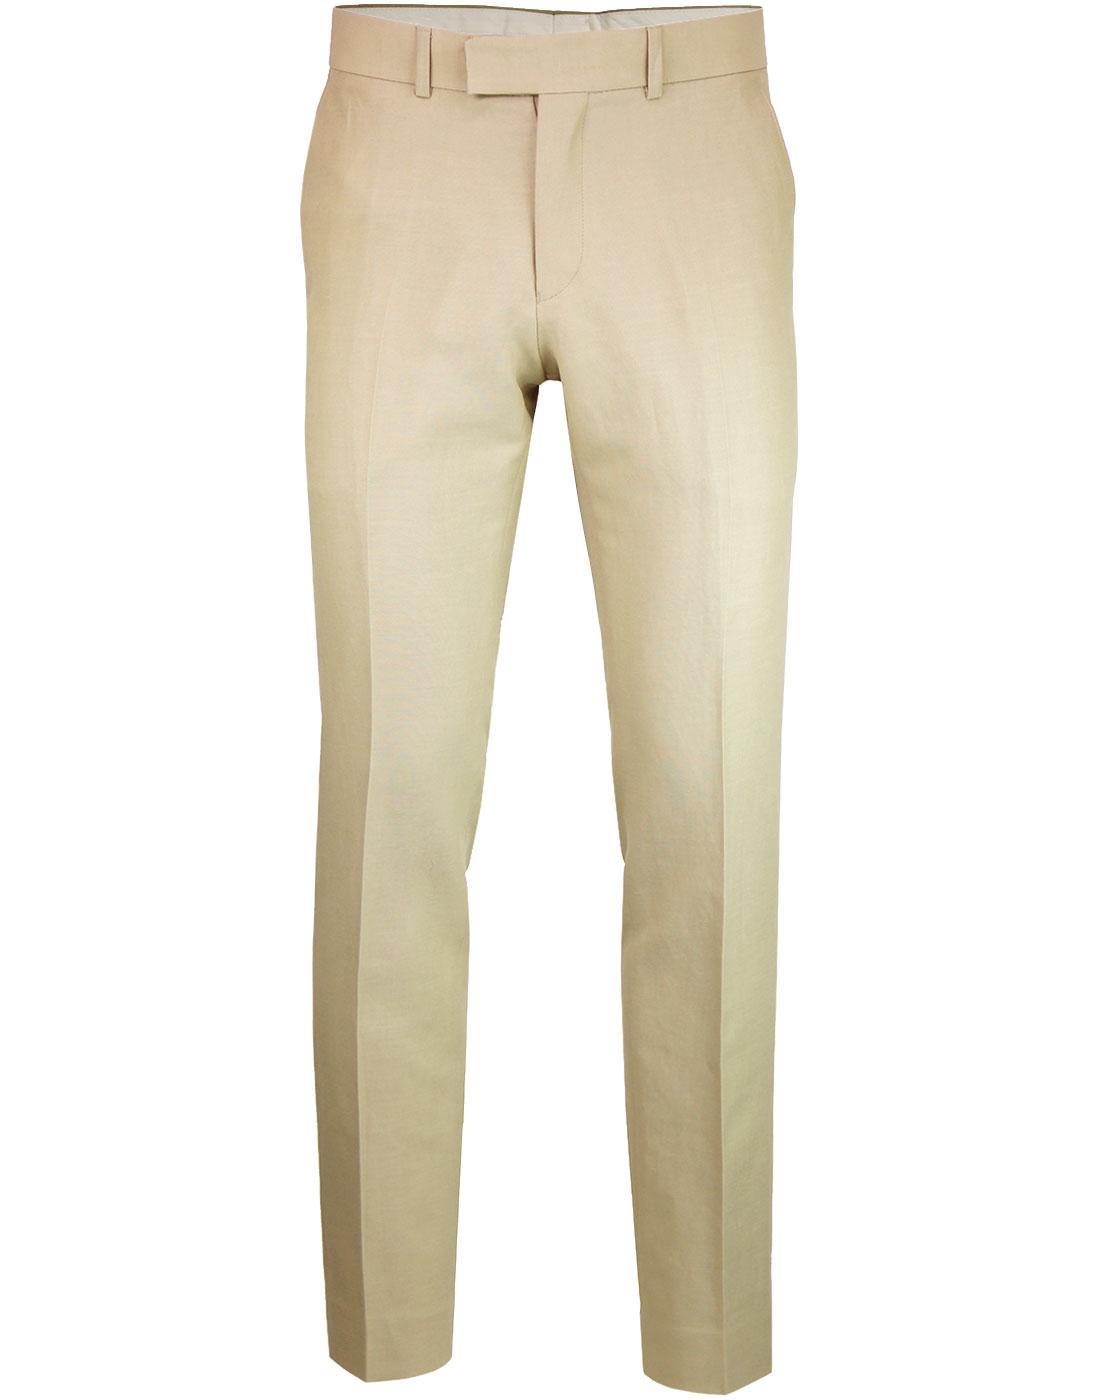 Radisson GIBSON LONDON Smart Plain Trousers STONE